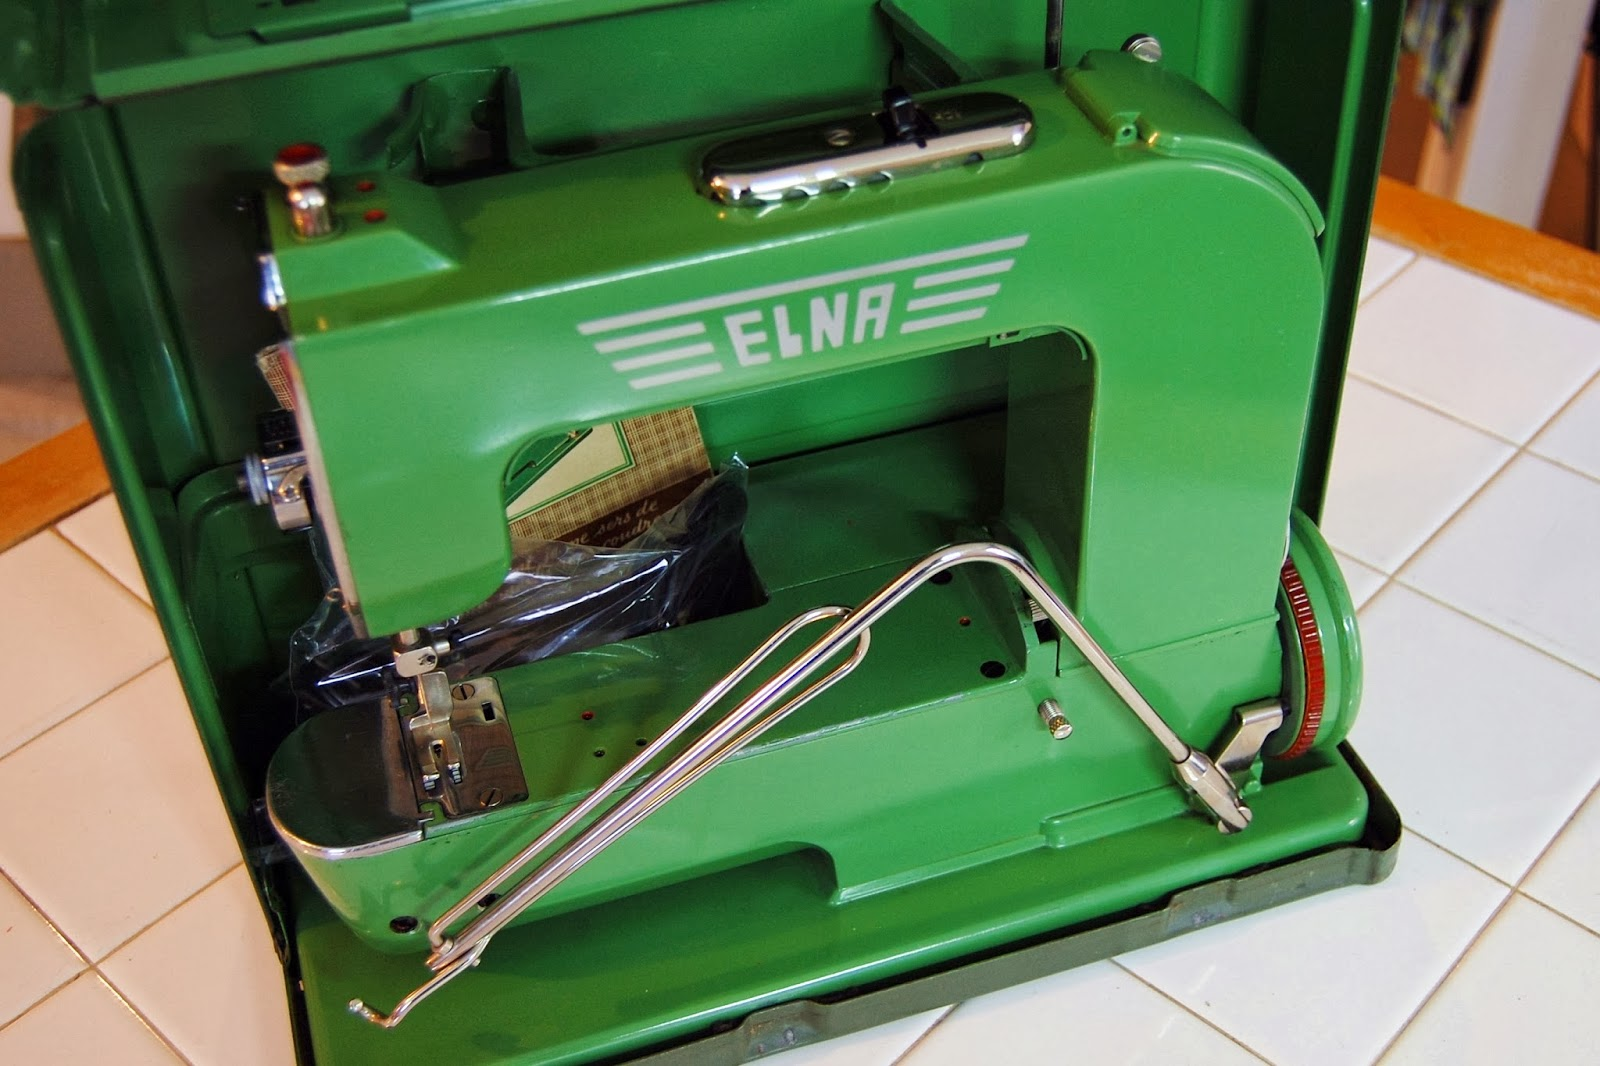 miss sews it all 1950 elna 1 grasshopper rh sewsitall blogspot com Elna Sewing Machine Repair Elna Capacitor